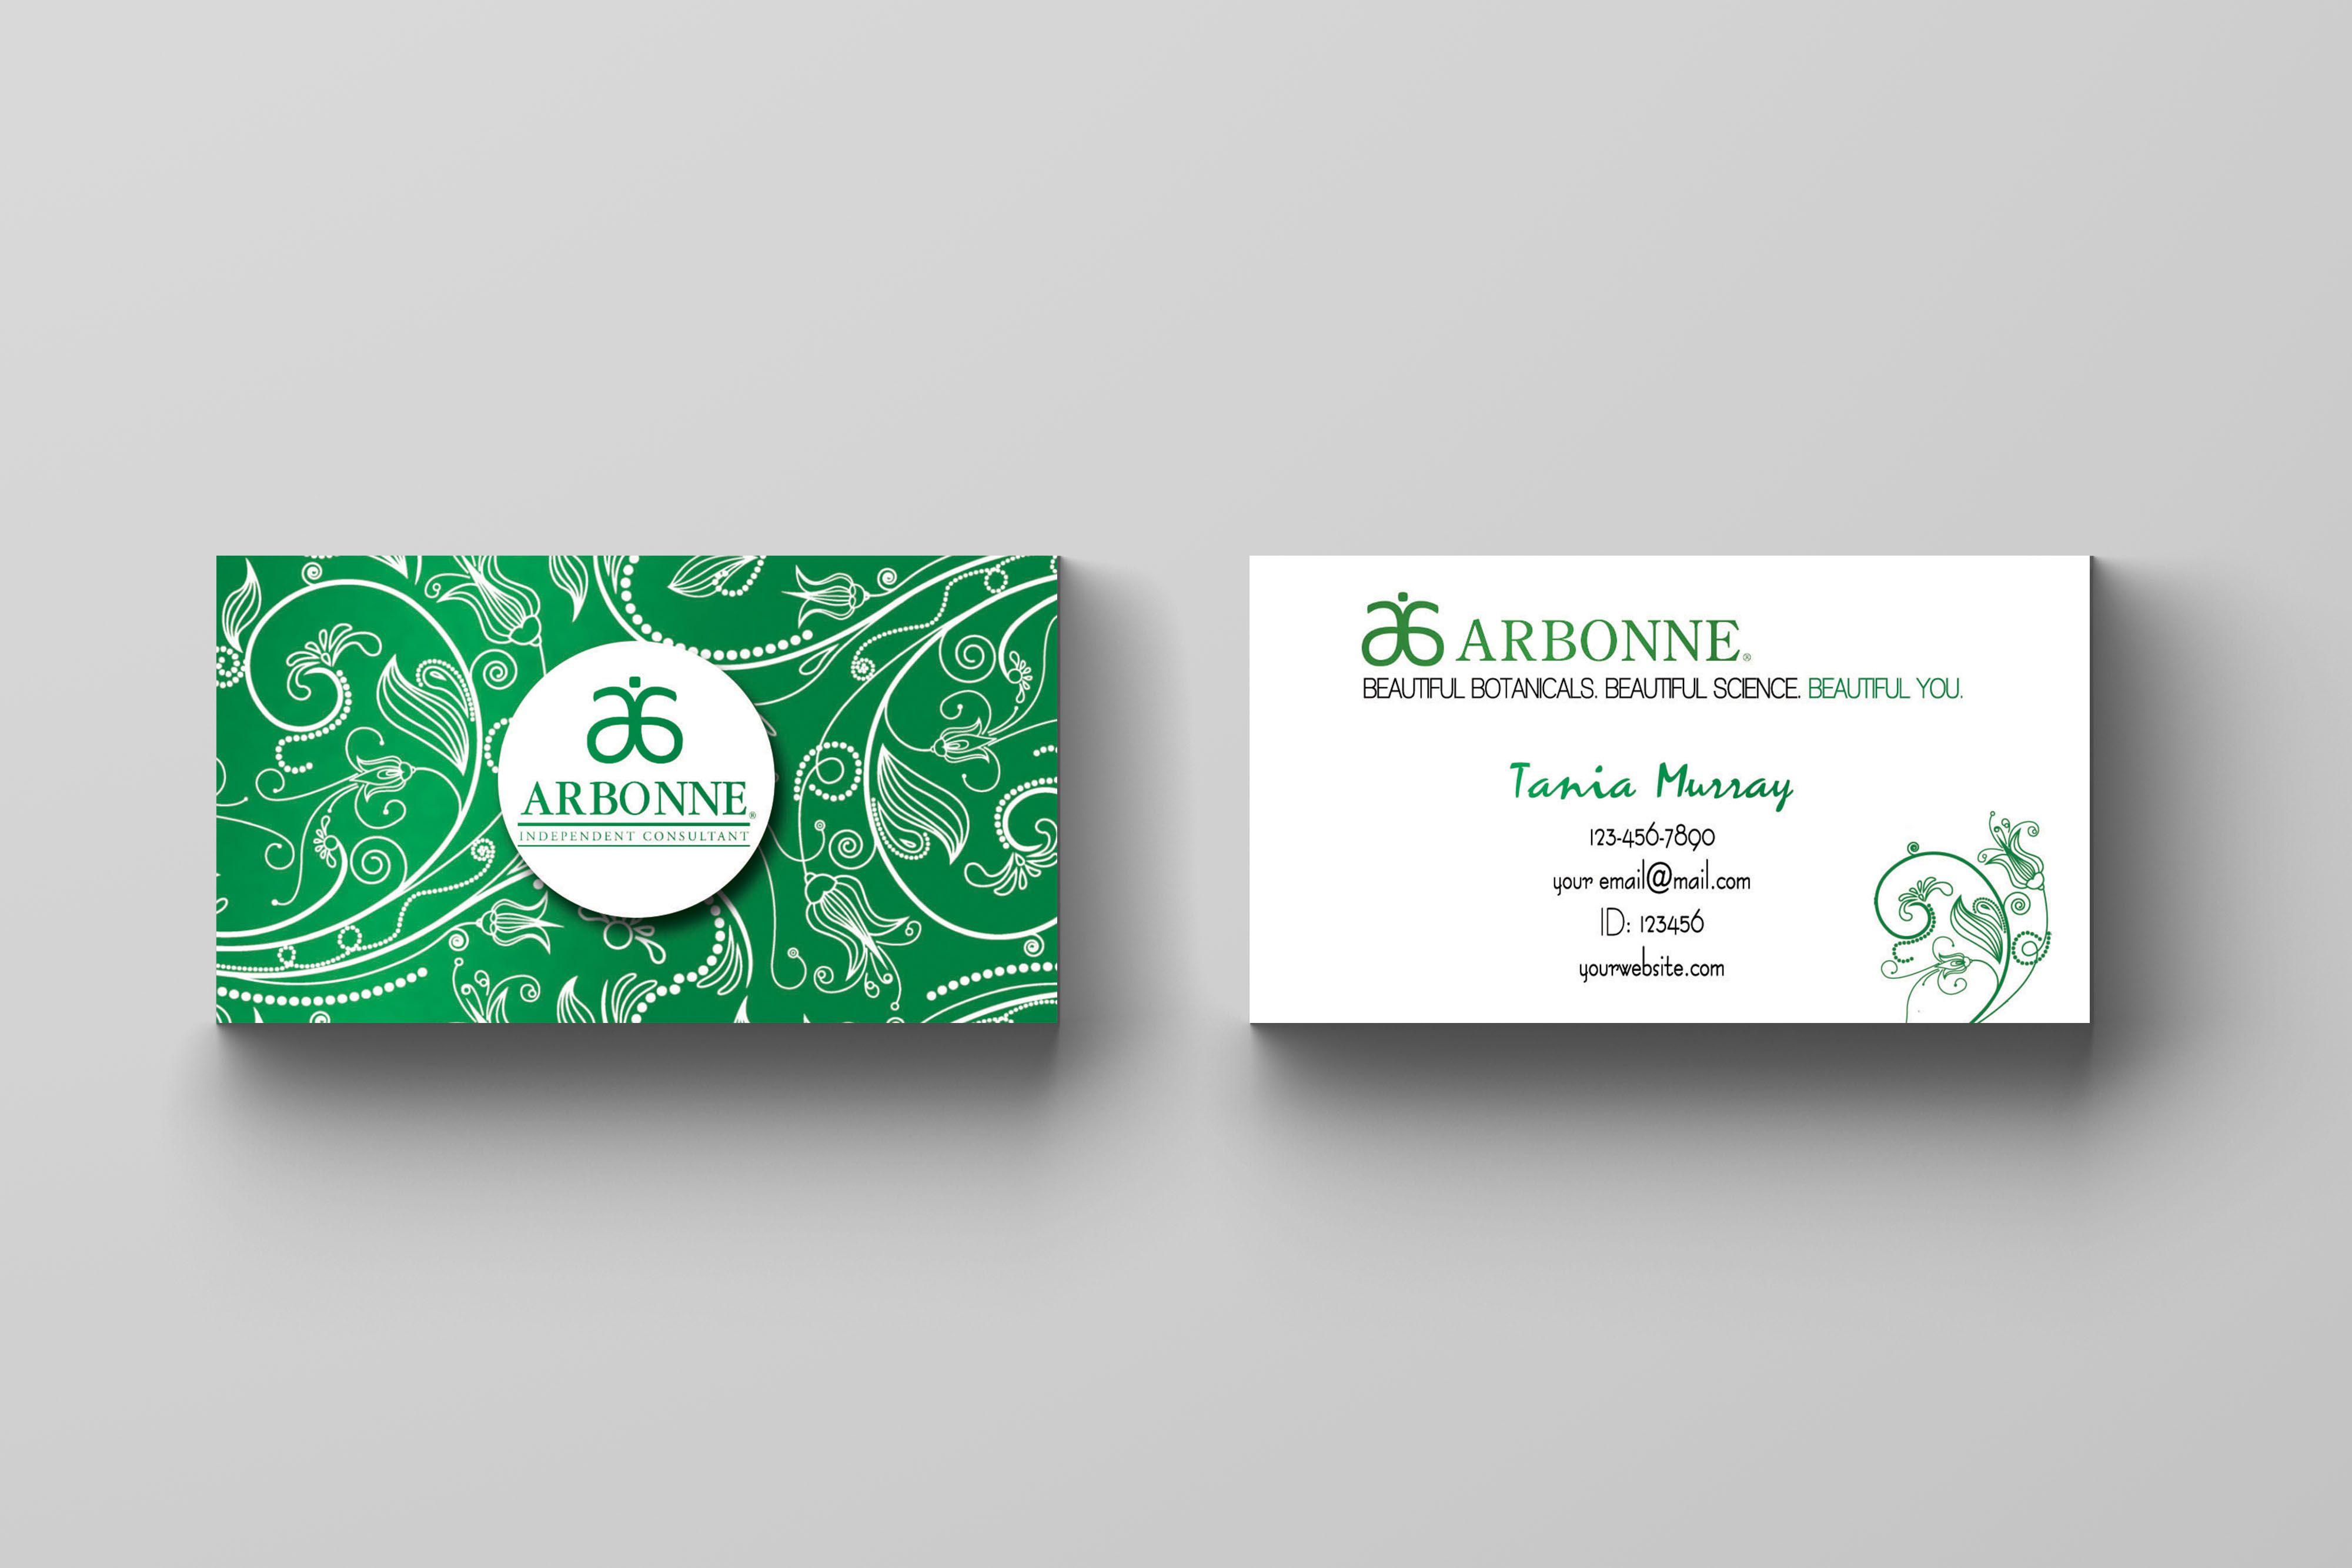 Arbonne Business Card Floral Green Kakaodesigns Arbonne Business Cards Classic Business Card Arbonne Business